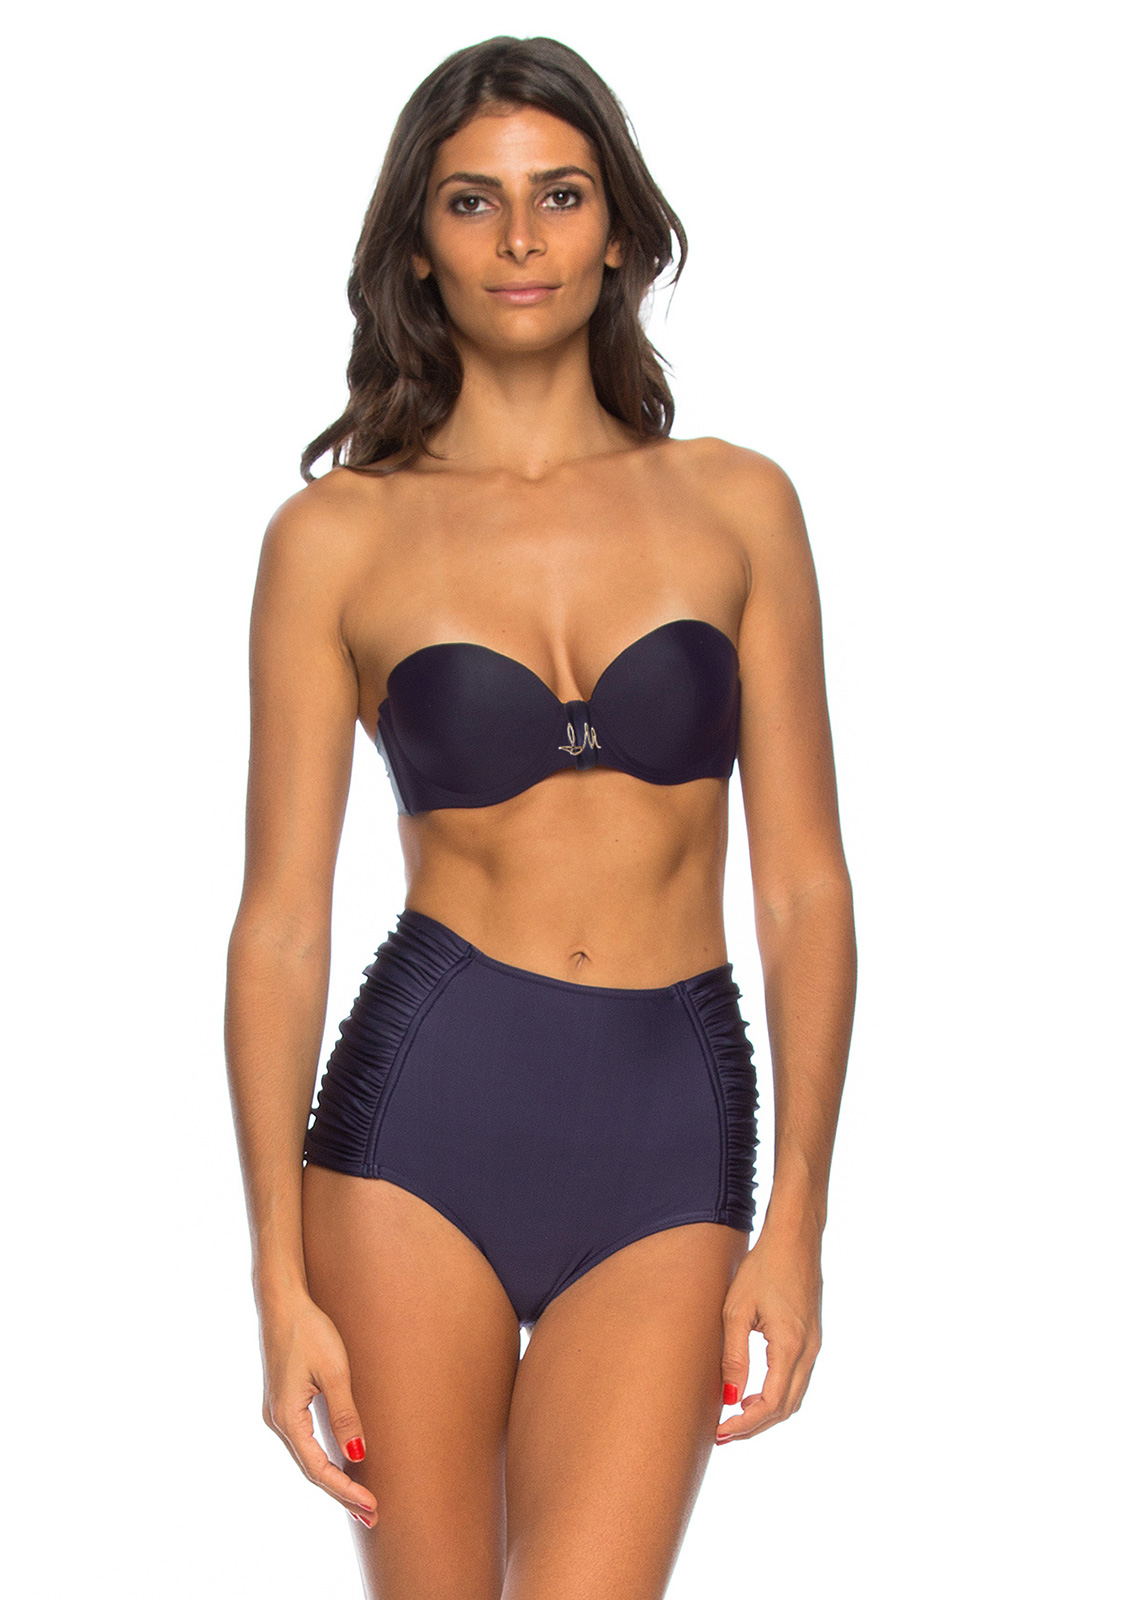 55f8eb62319 Midnight Blue High-waisted Bikini With Bandeau Top - Leonice - Lua ...